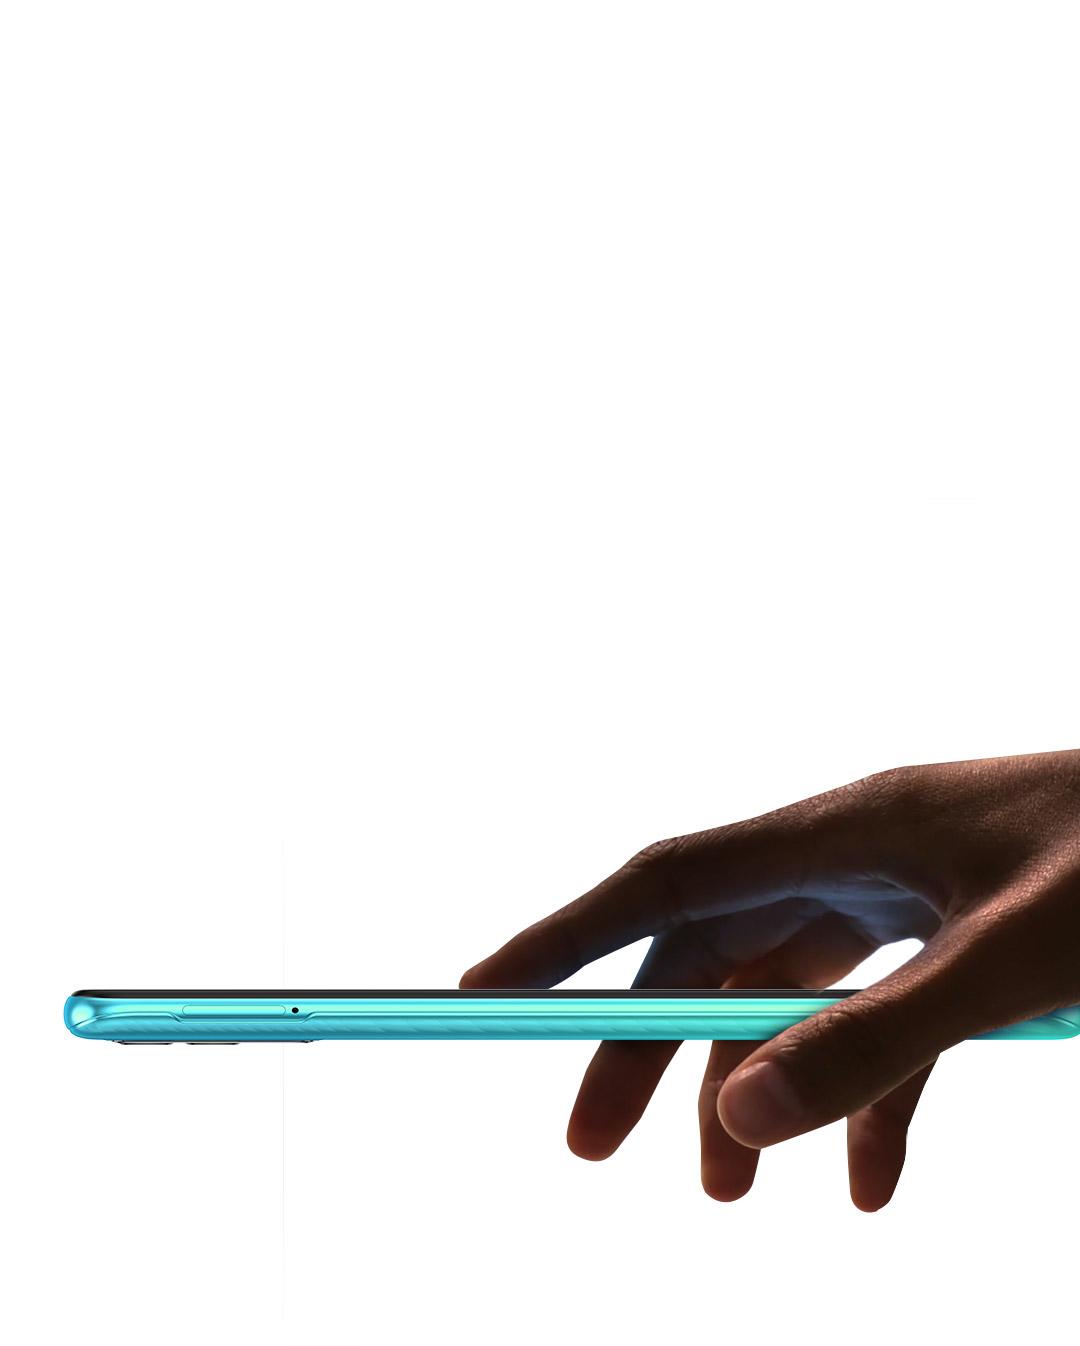 TECNO SPARK 7 T Slim phone